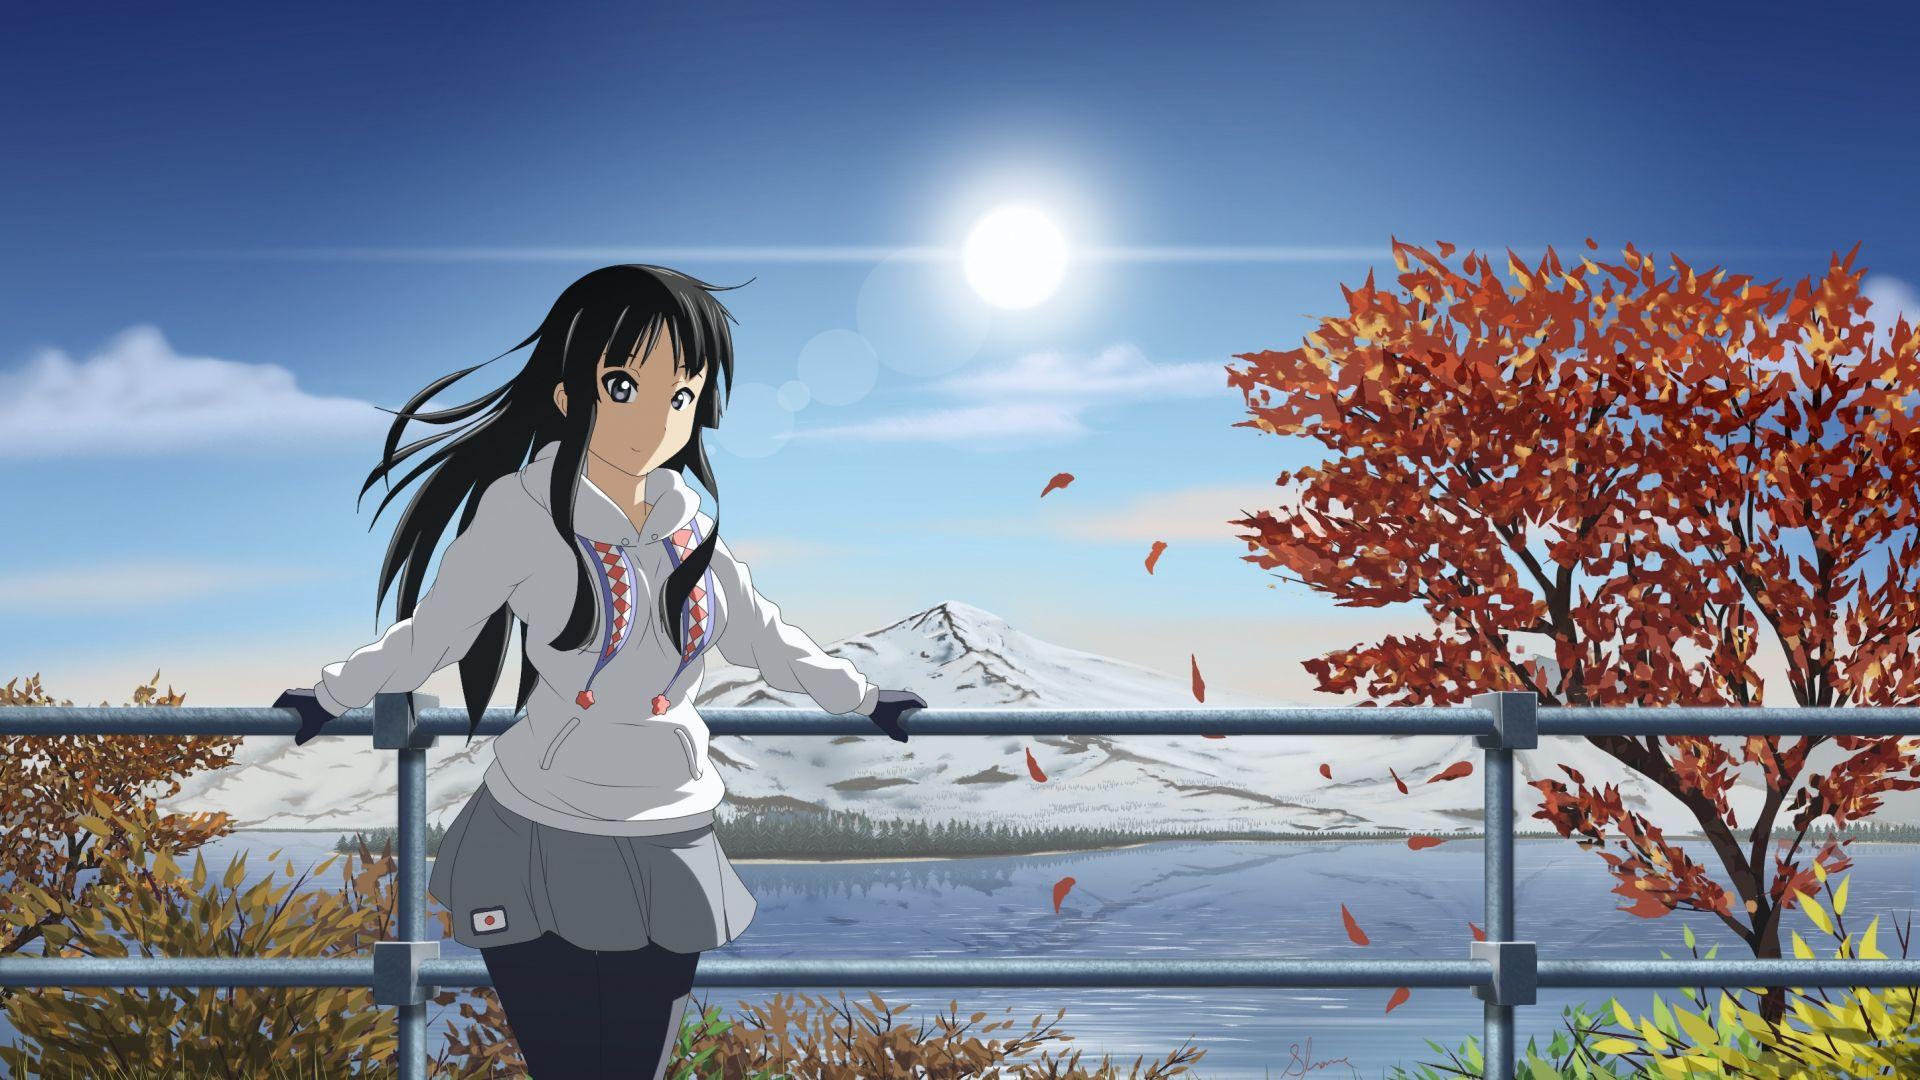 wallpaper anime mio akiyama girl beauty 8k art 15961